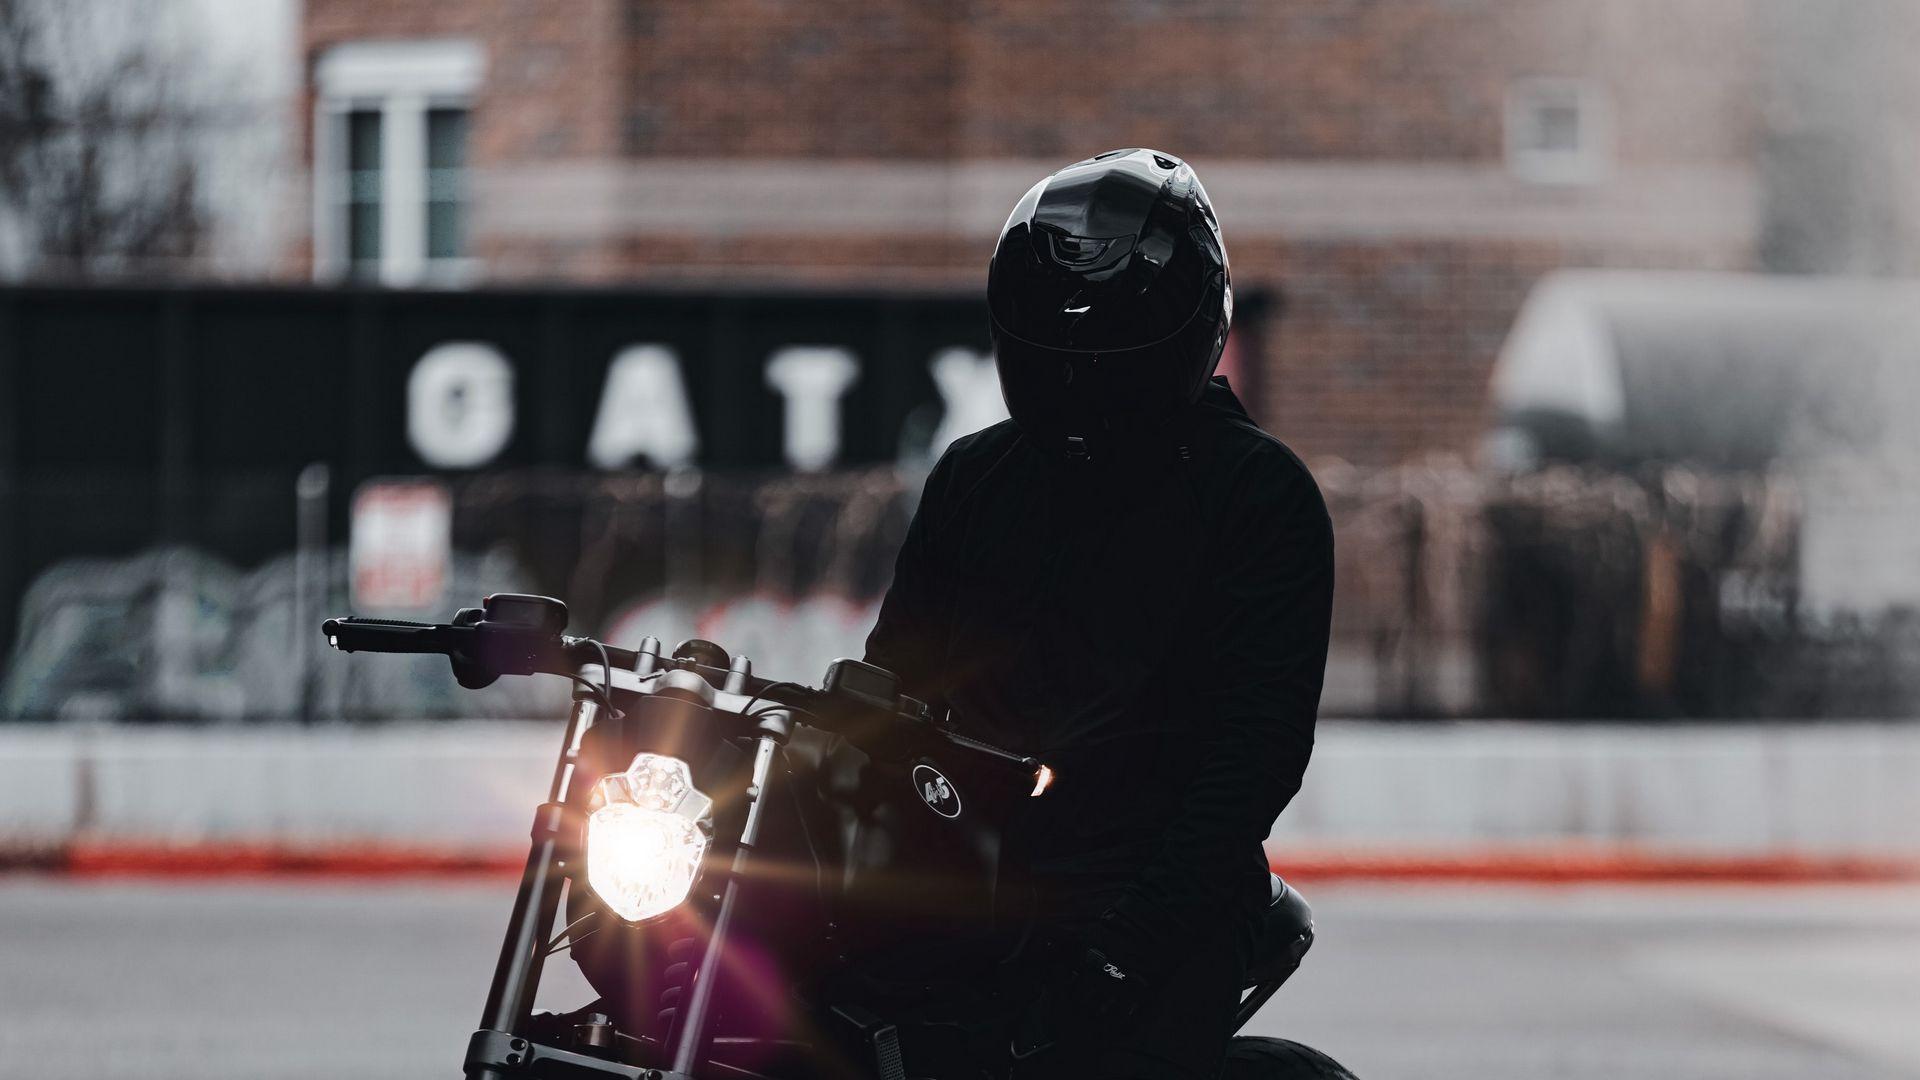 1920x1080 Обои мотоцикл, байк, мотоциклист, черный, свет, дорога